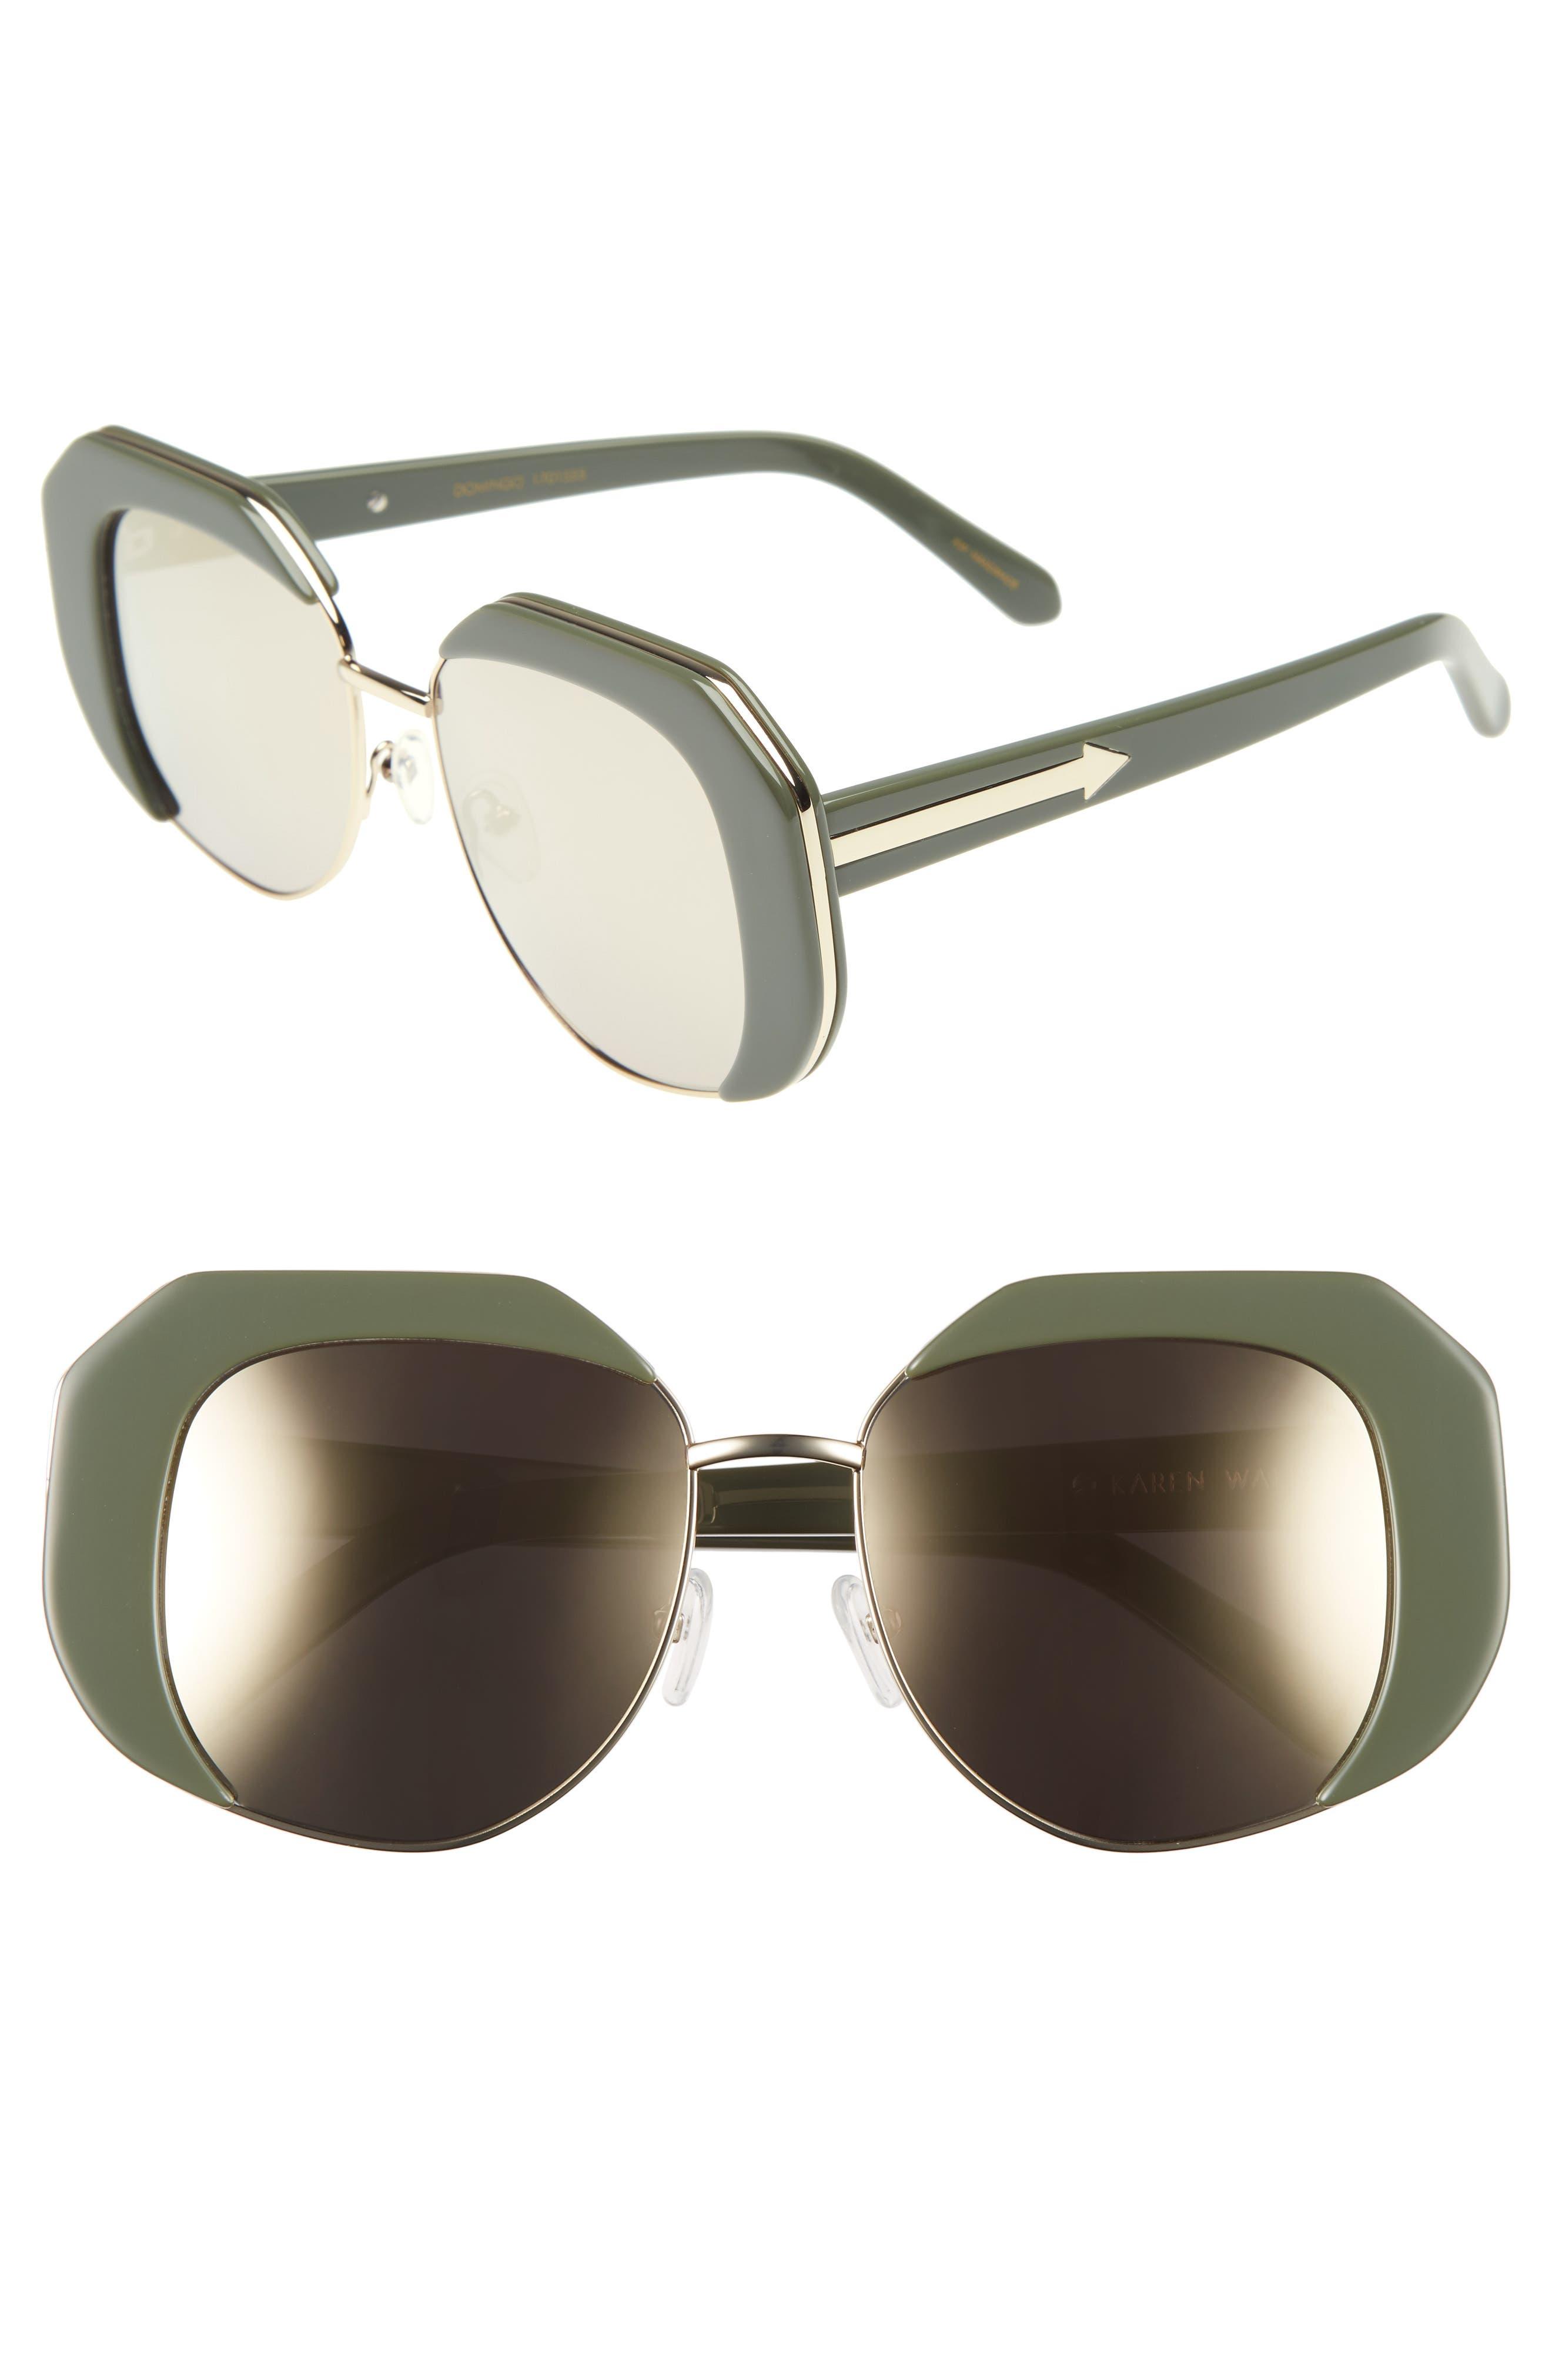 Domingo 52mm Sunglasses,                         Main,                         color, Khaki/ Gold